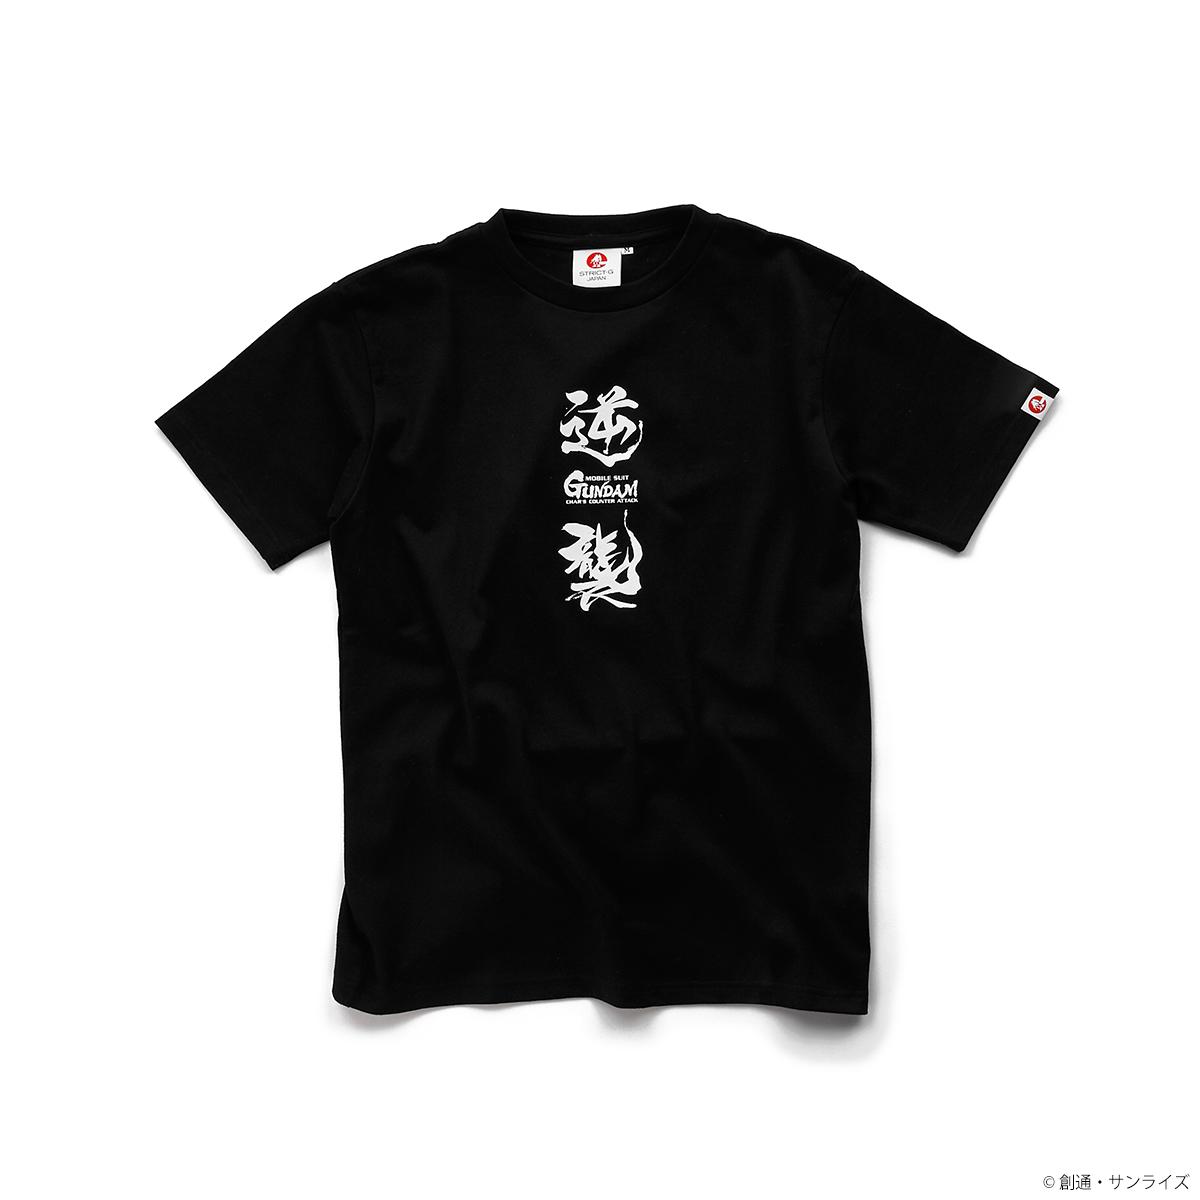 STRICT-G JAPAN Mobile Suit Gundam Counterattack Char T-shirt Sazabi brush design